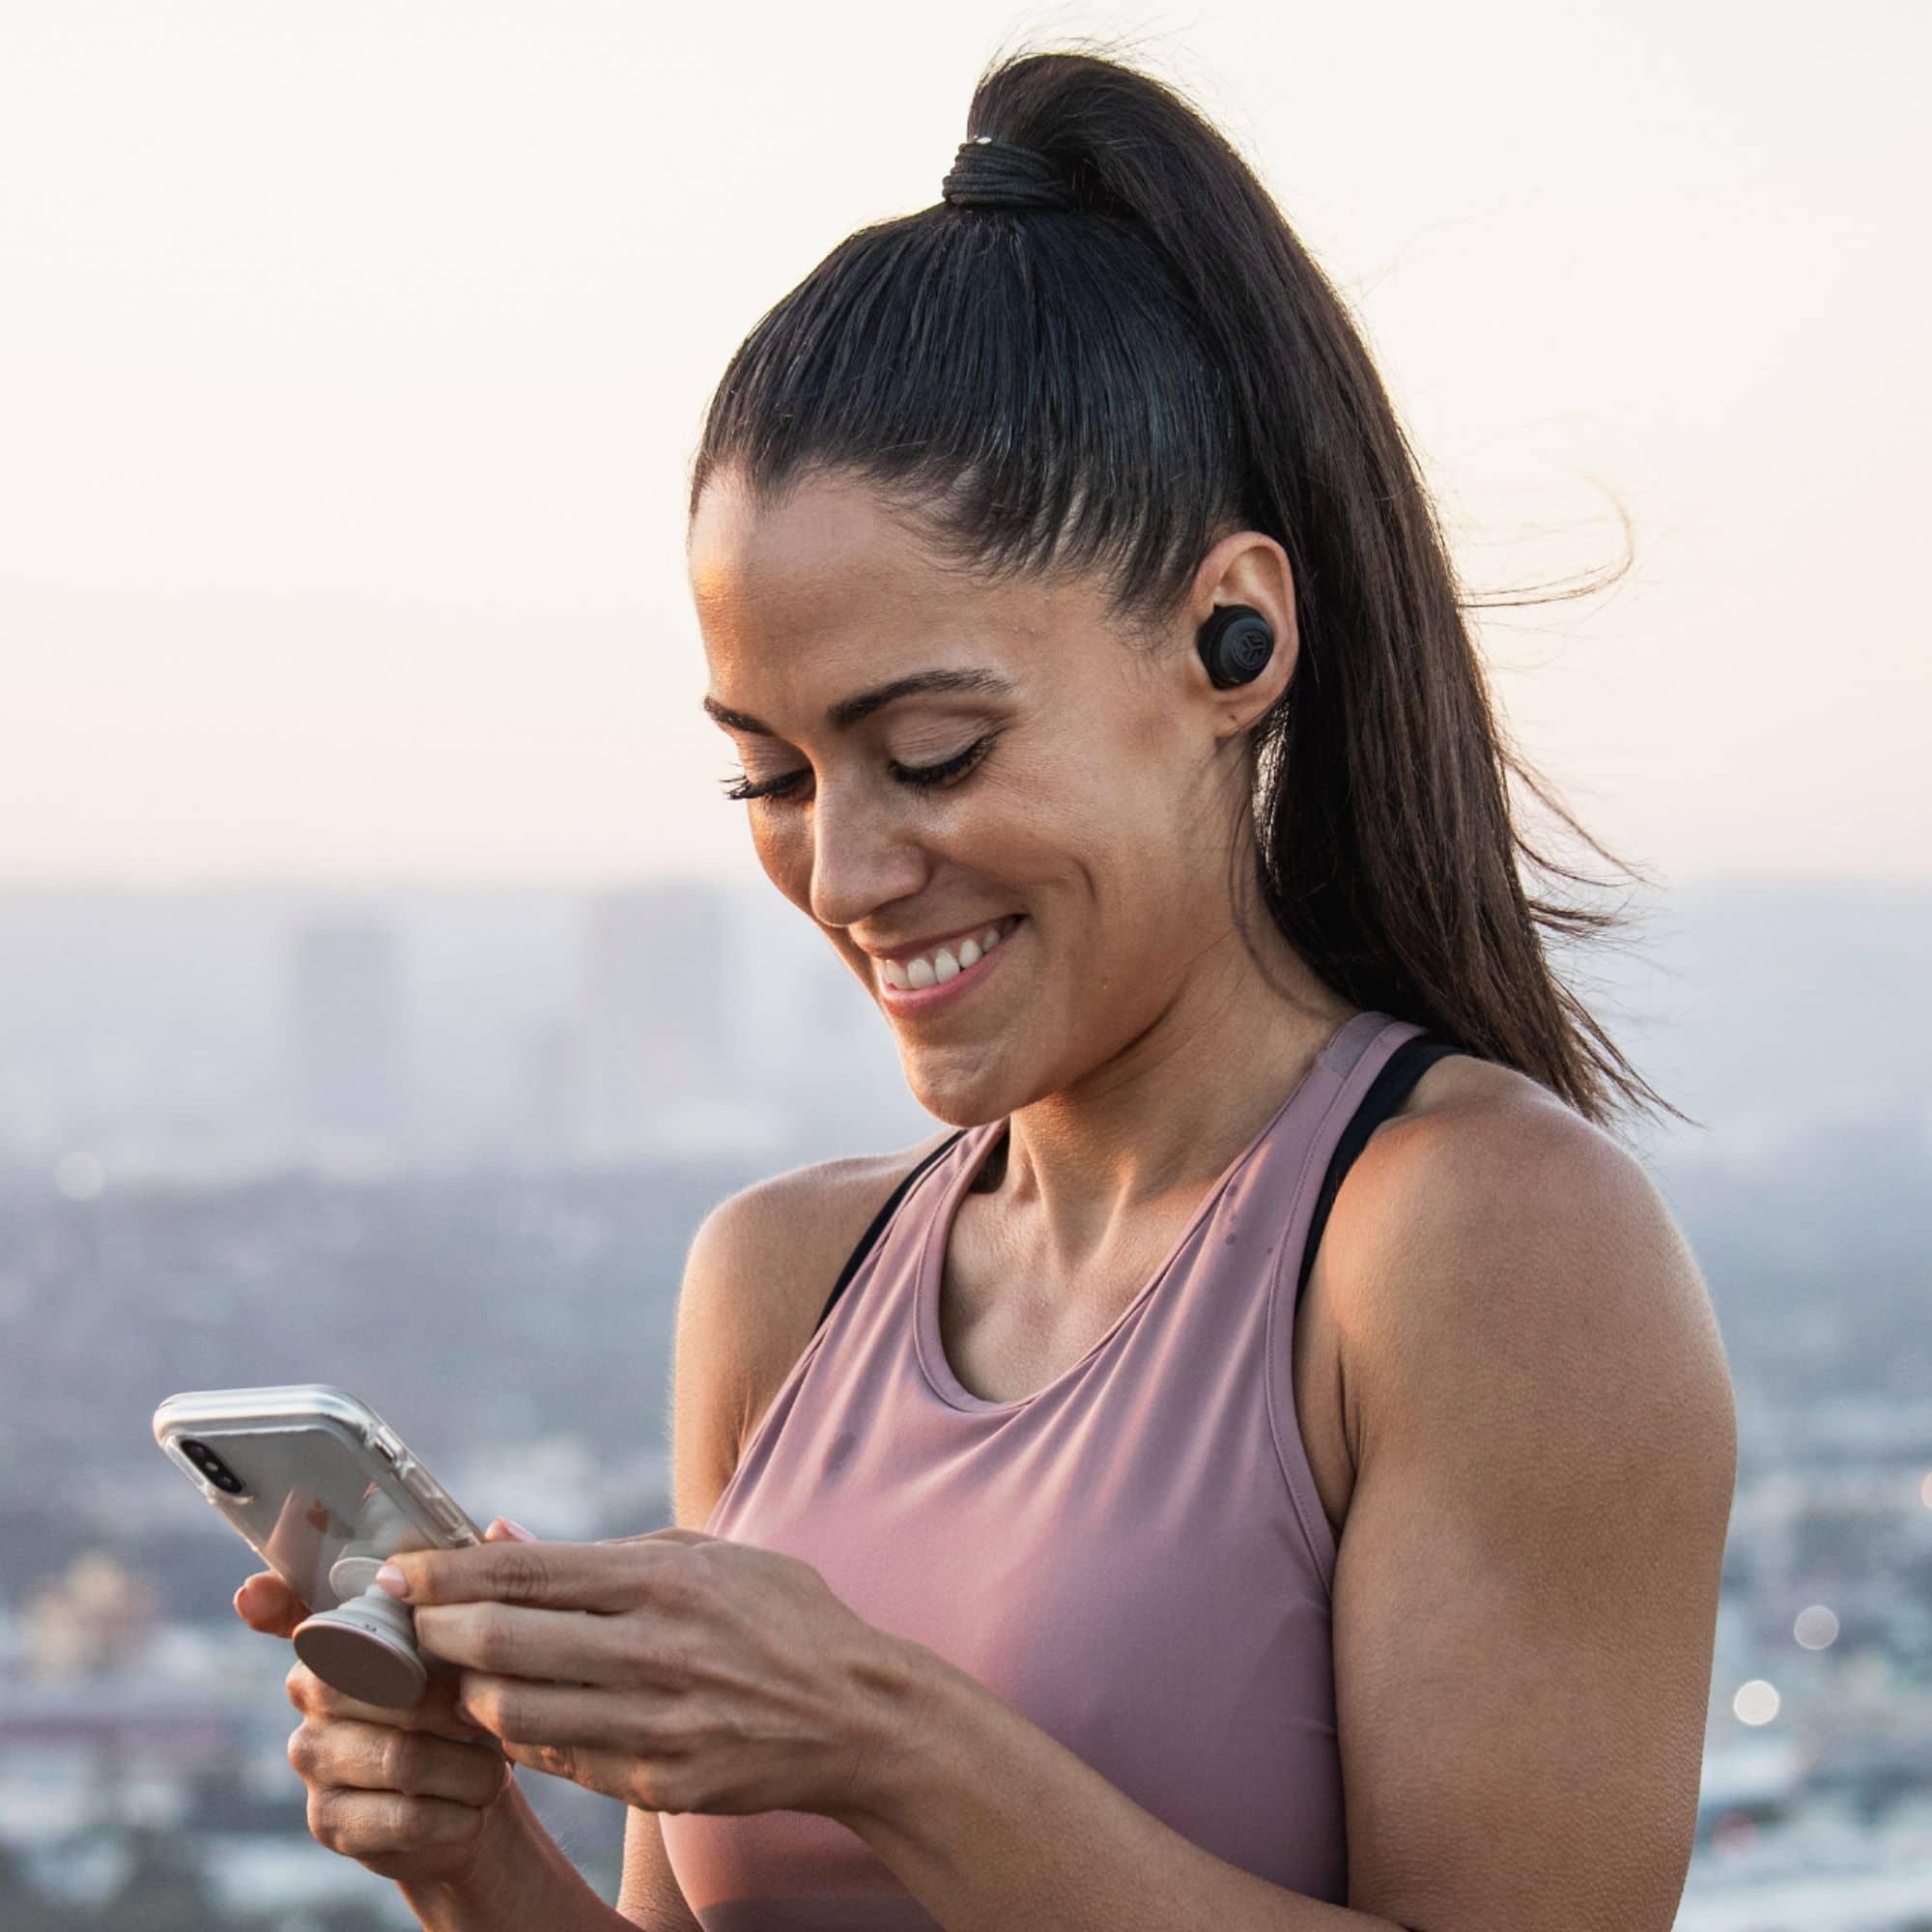 True Wireless Earbud under $100 – JLab Audio